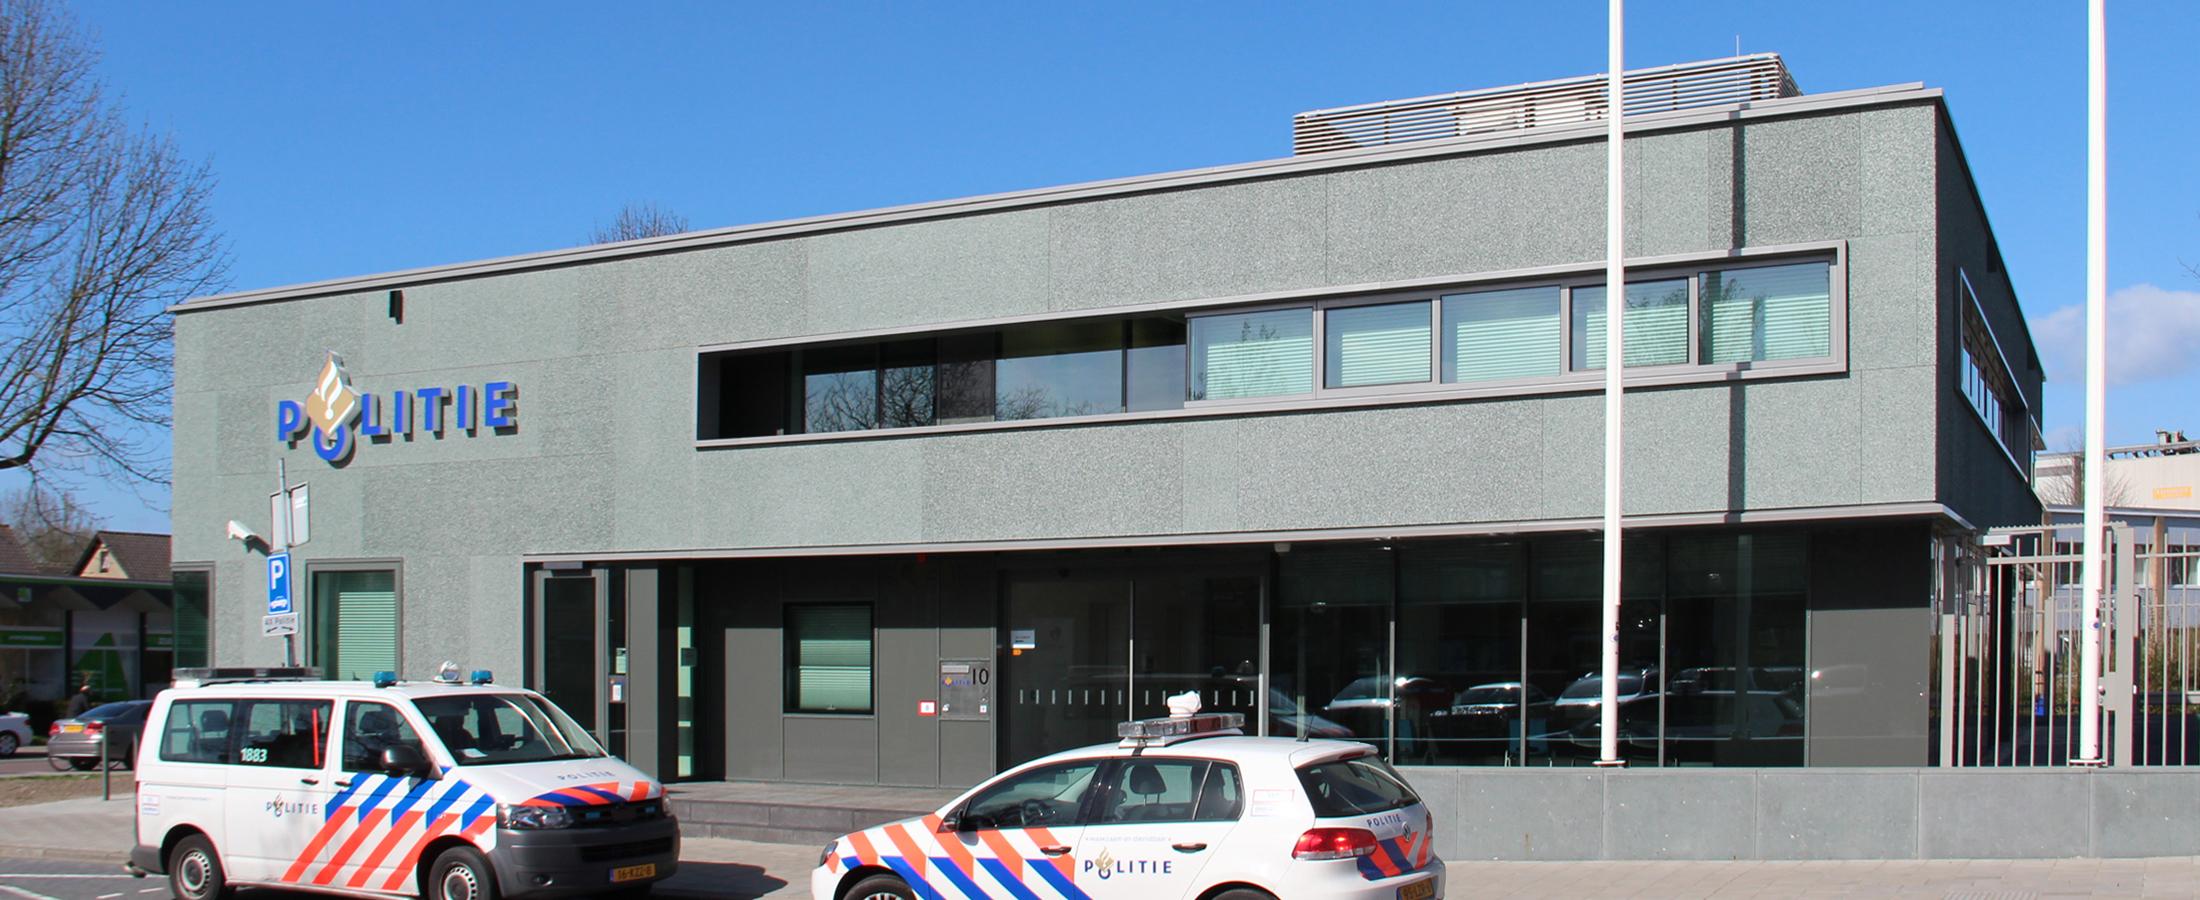 Politiebureau, Lansingerland